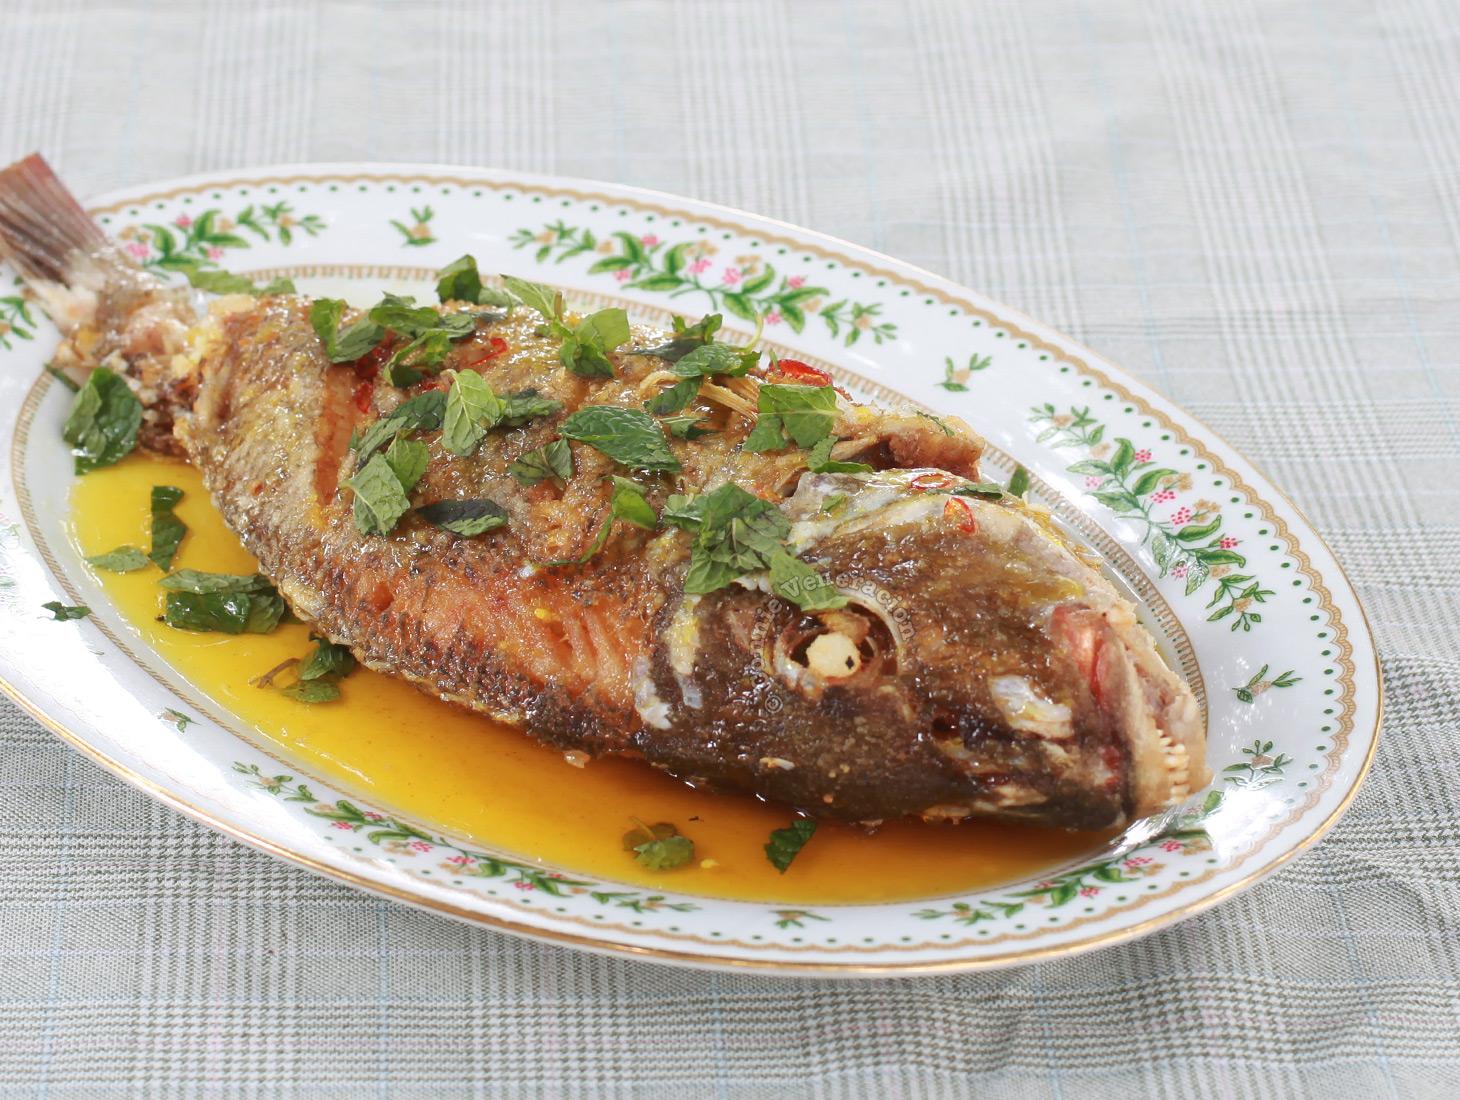 Fried Whole Fish with Lemon Sauce